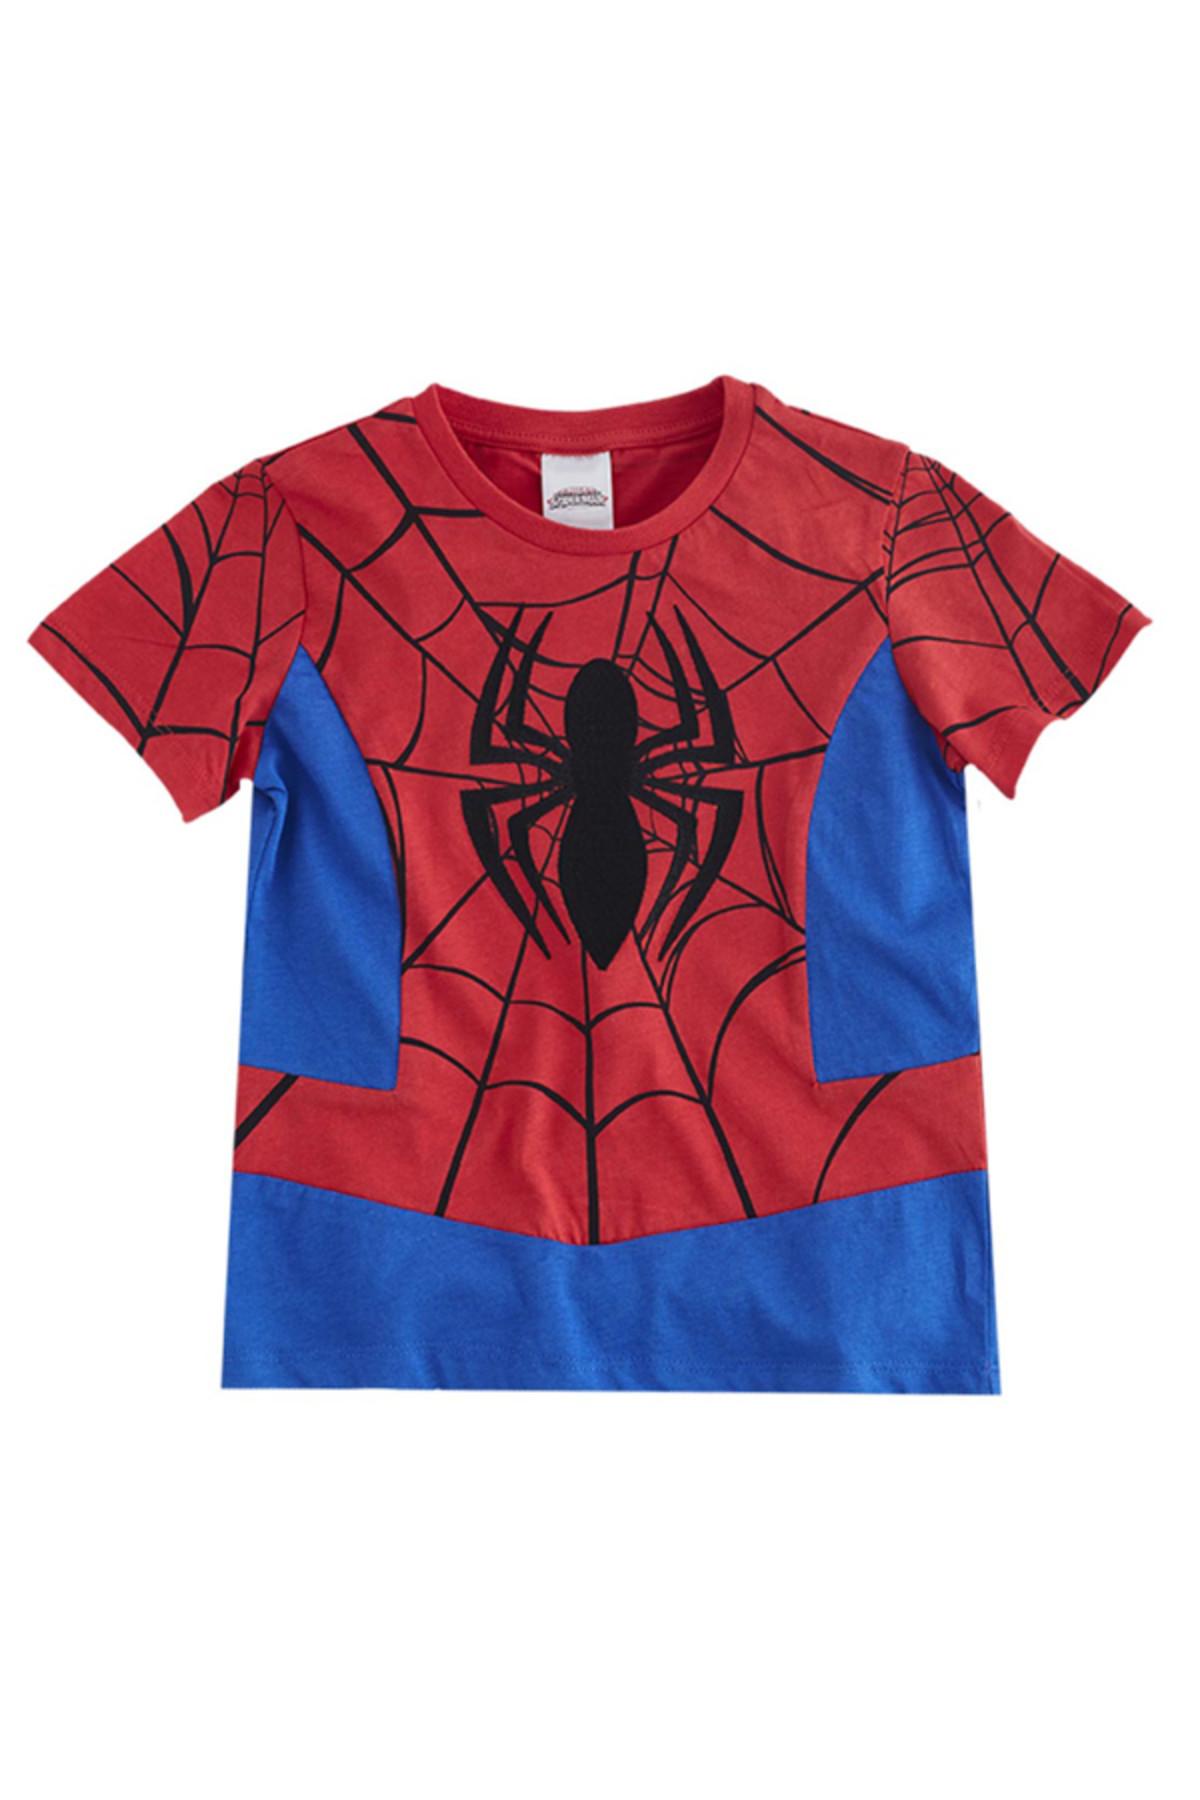 Soobe Ultimate Spider-Man Kısa Kol T-Shirt  Kırmızı   15YECTSRT1324_17-1563 1